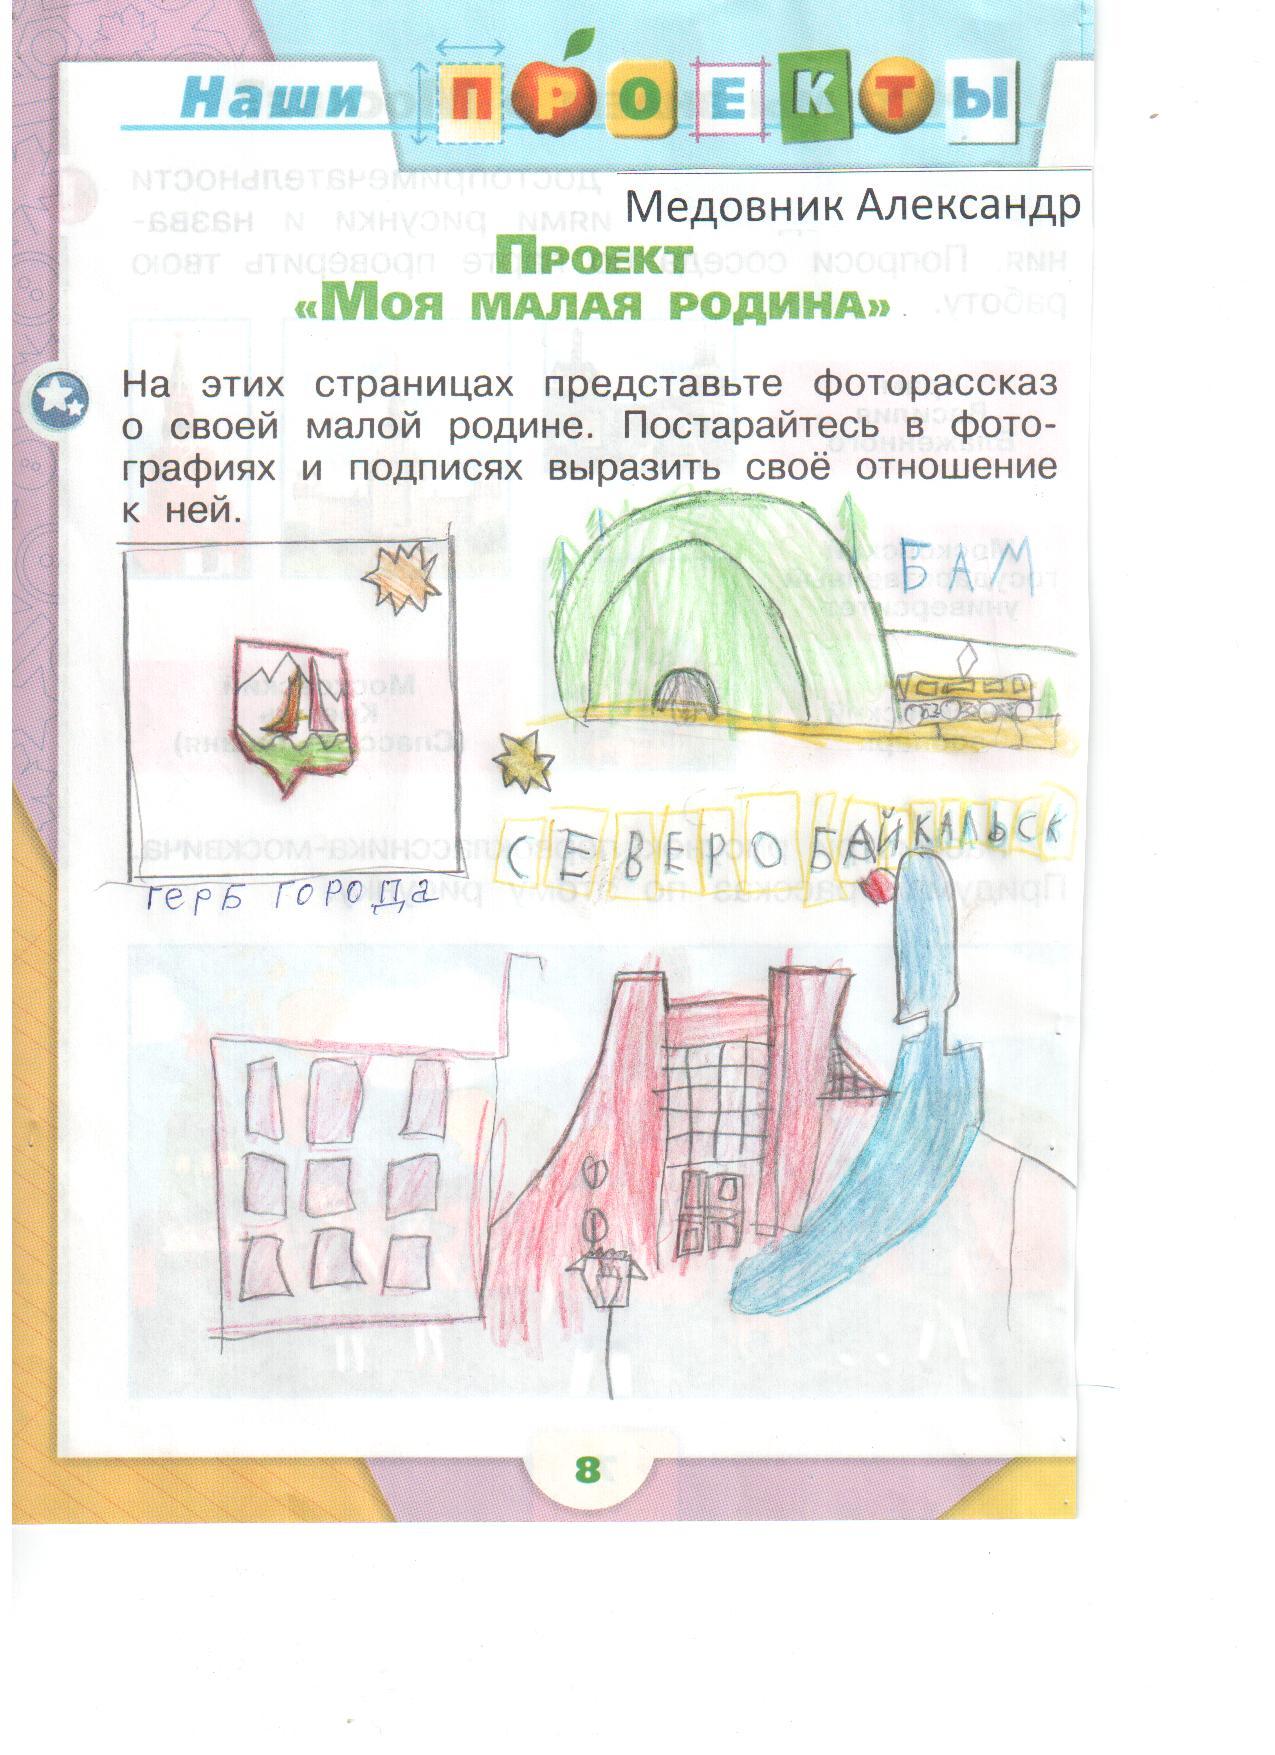 C:\Documents and Settings\Учитель\Мои документы\Мои рисунки\Изображение\прект.jpg